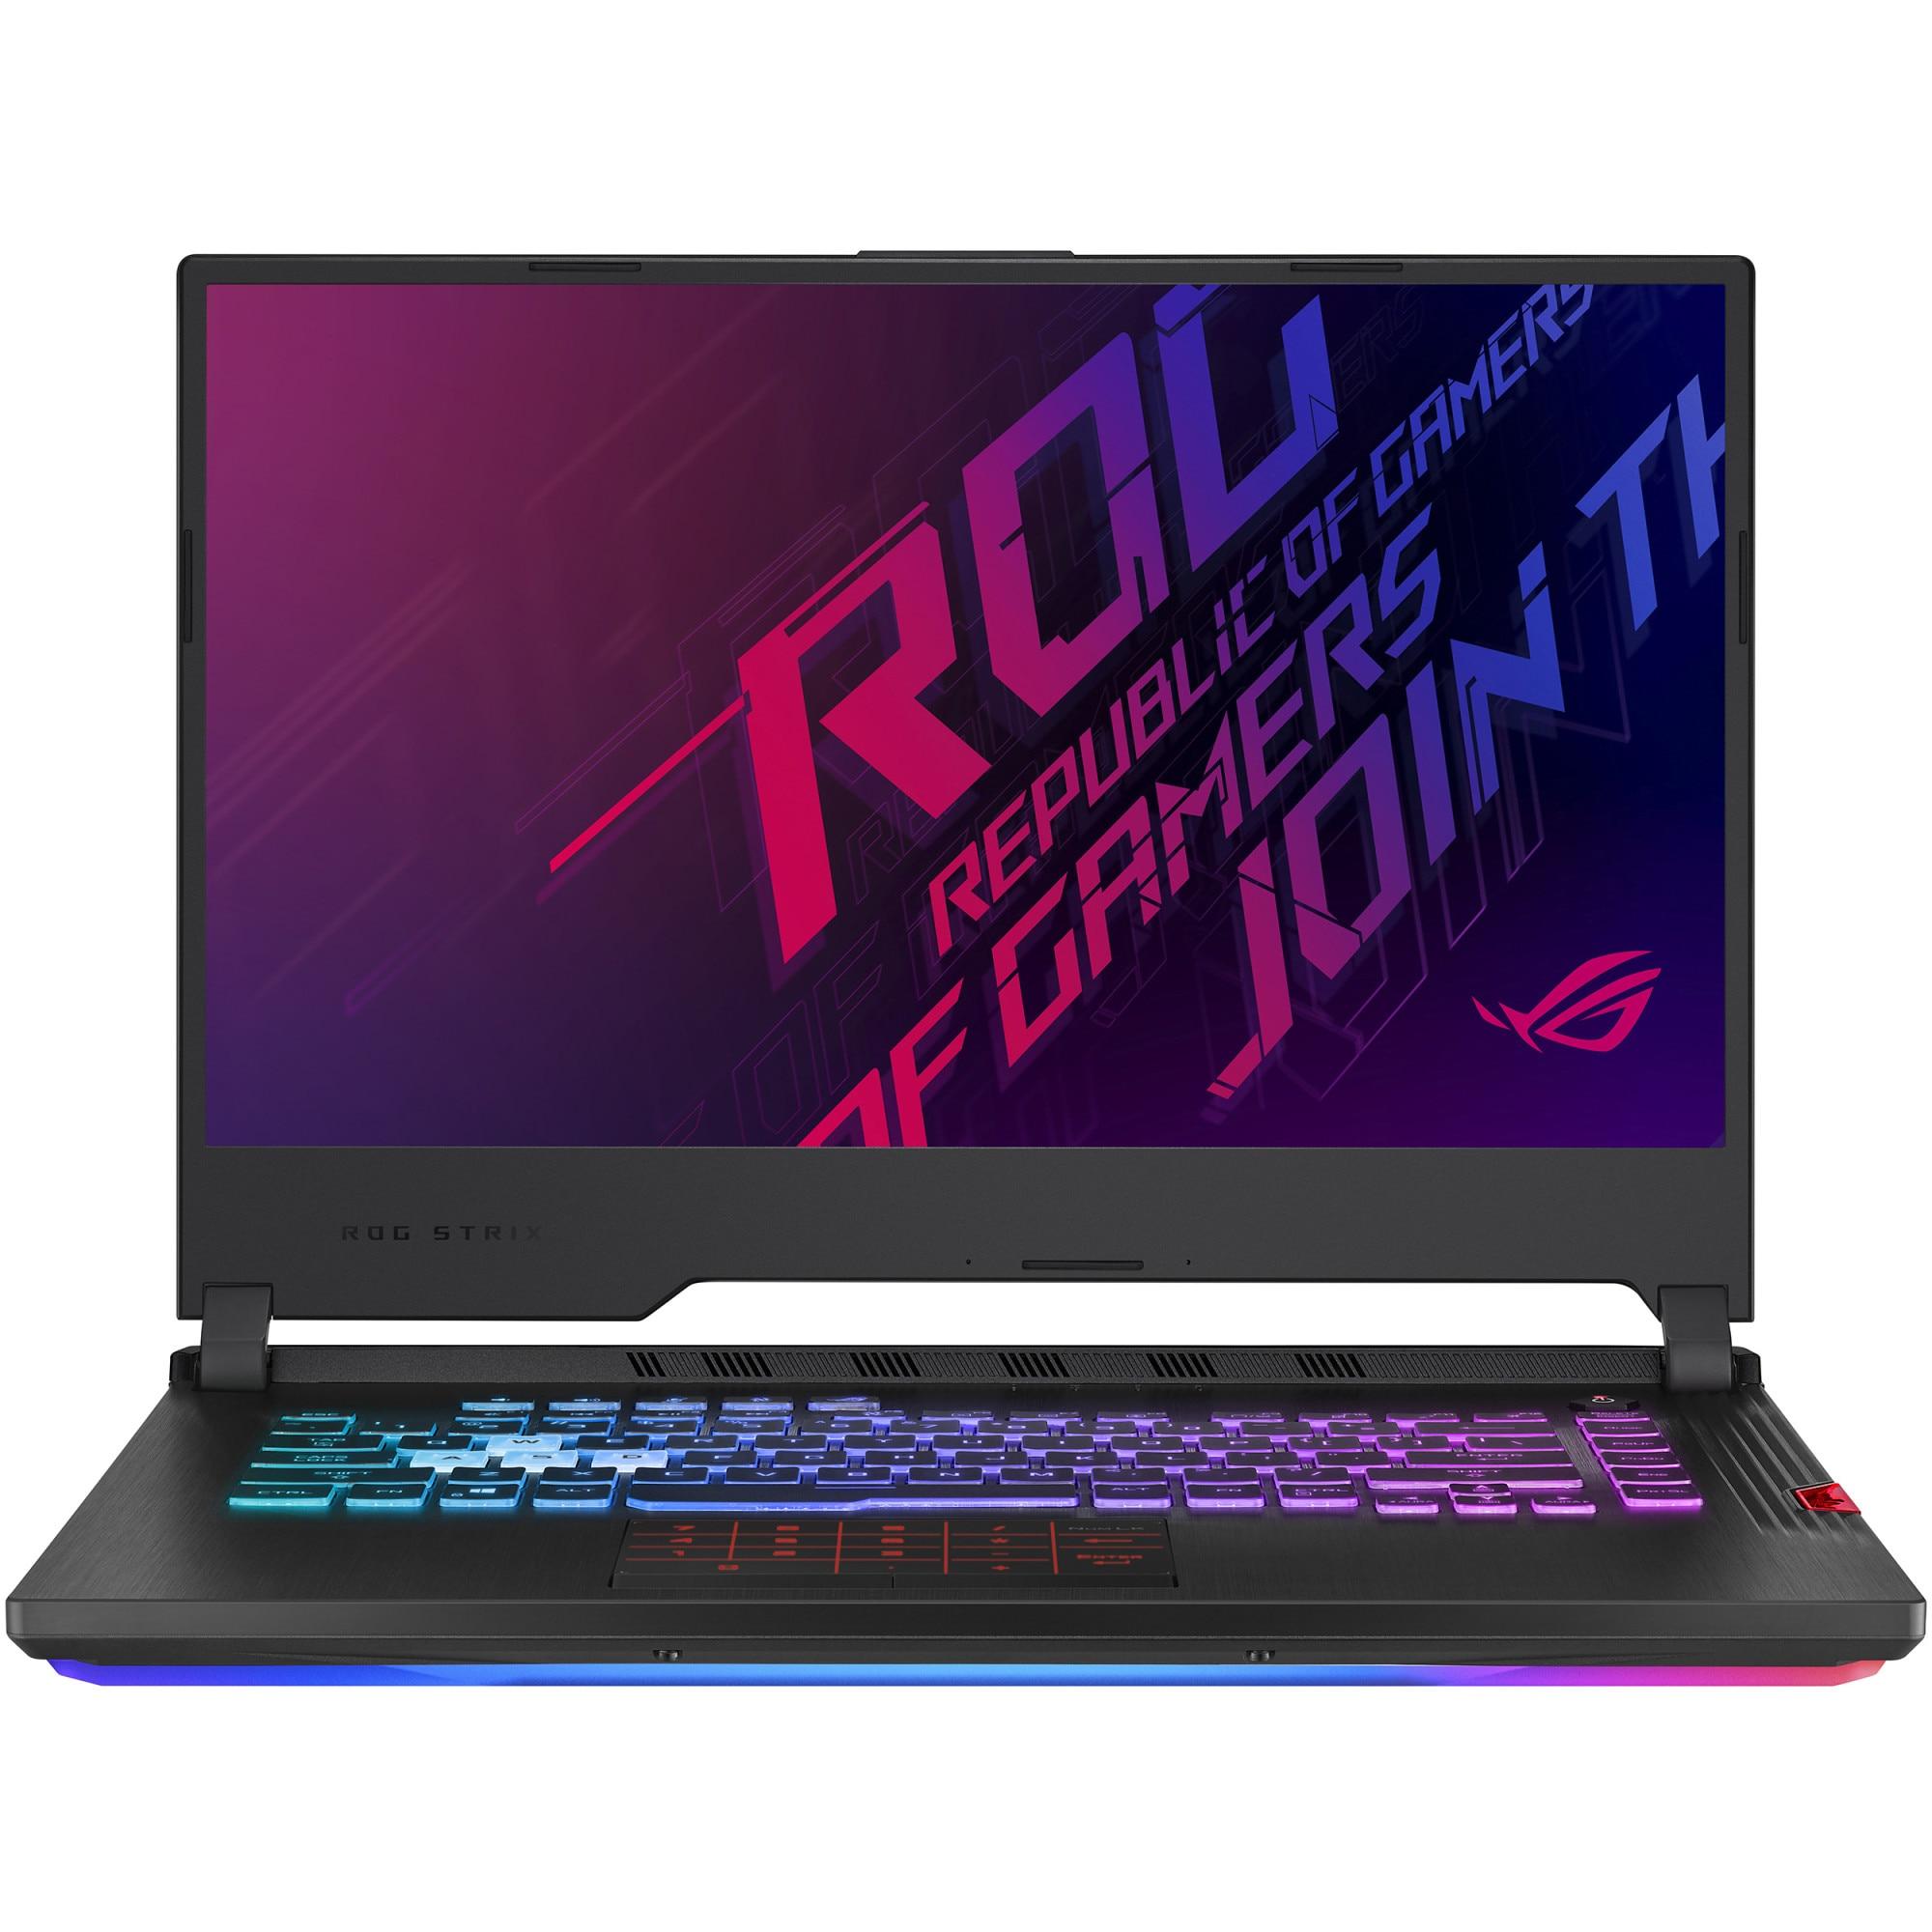 "Fotografie Laptop gaming ASUS ROG Strix Hero III G531GV cu procesor Intel® Core™ i7-9750H pana la 4.50 GHz Coffee Lake, 15.6"", Full HD, IPS, 240Hz, 16GB, 512GB SSD, NVIDIA® GeForce RTX™ 2060 6GB, Free DOS, Midnight Black"